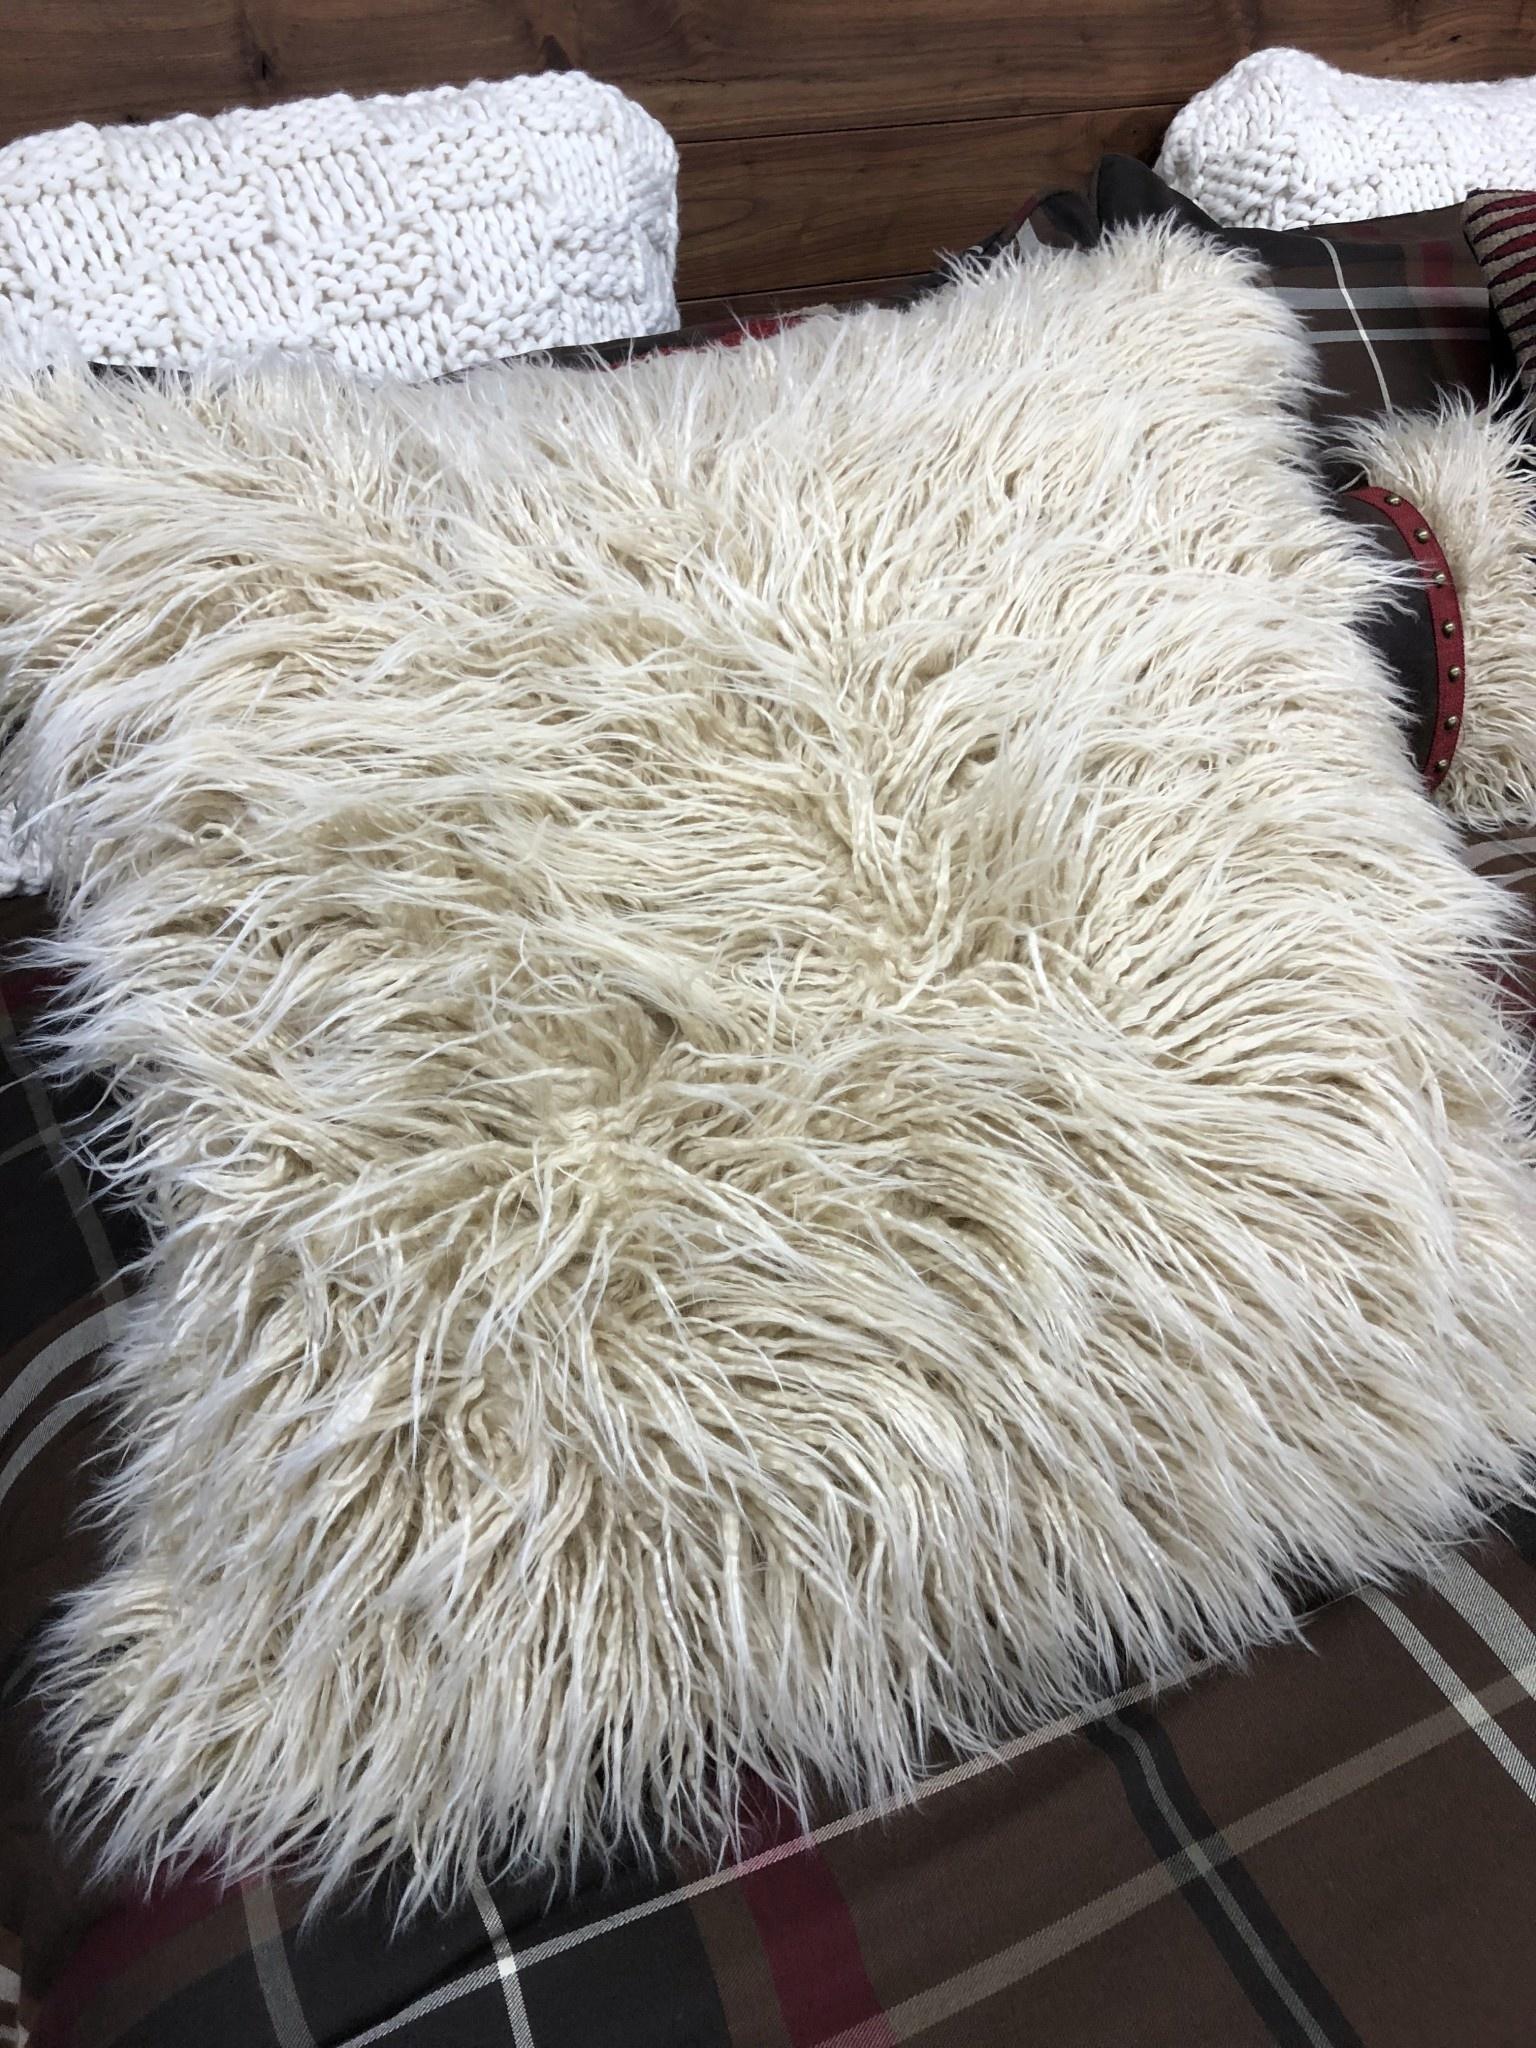 Hiend Mongolian Faux Fur Euro Sham Only, 27x27